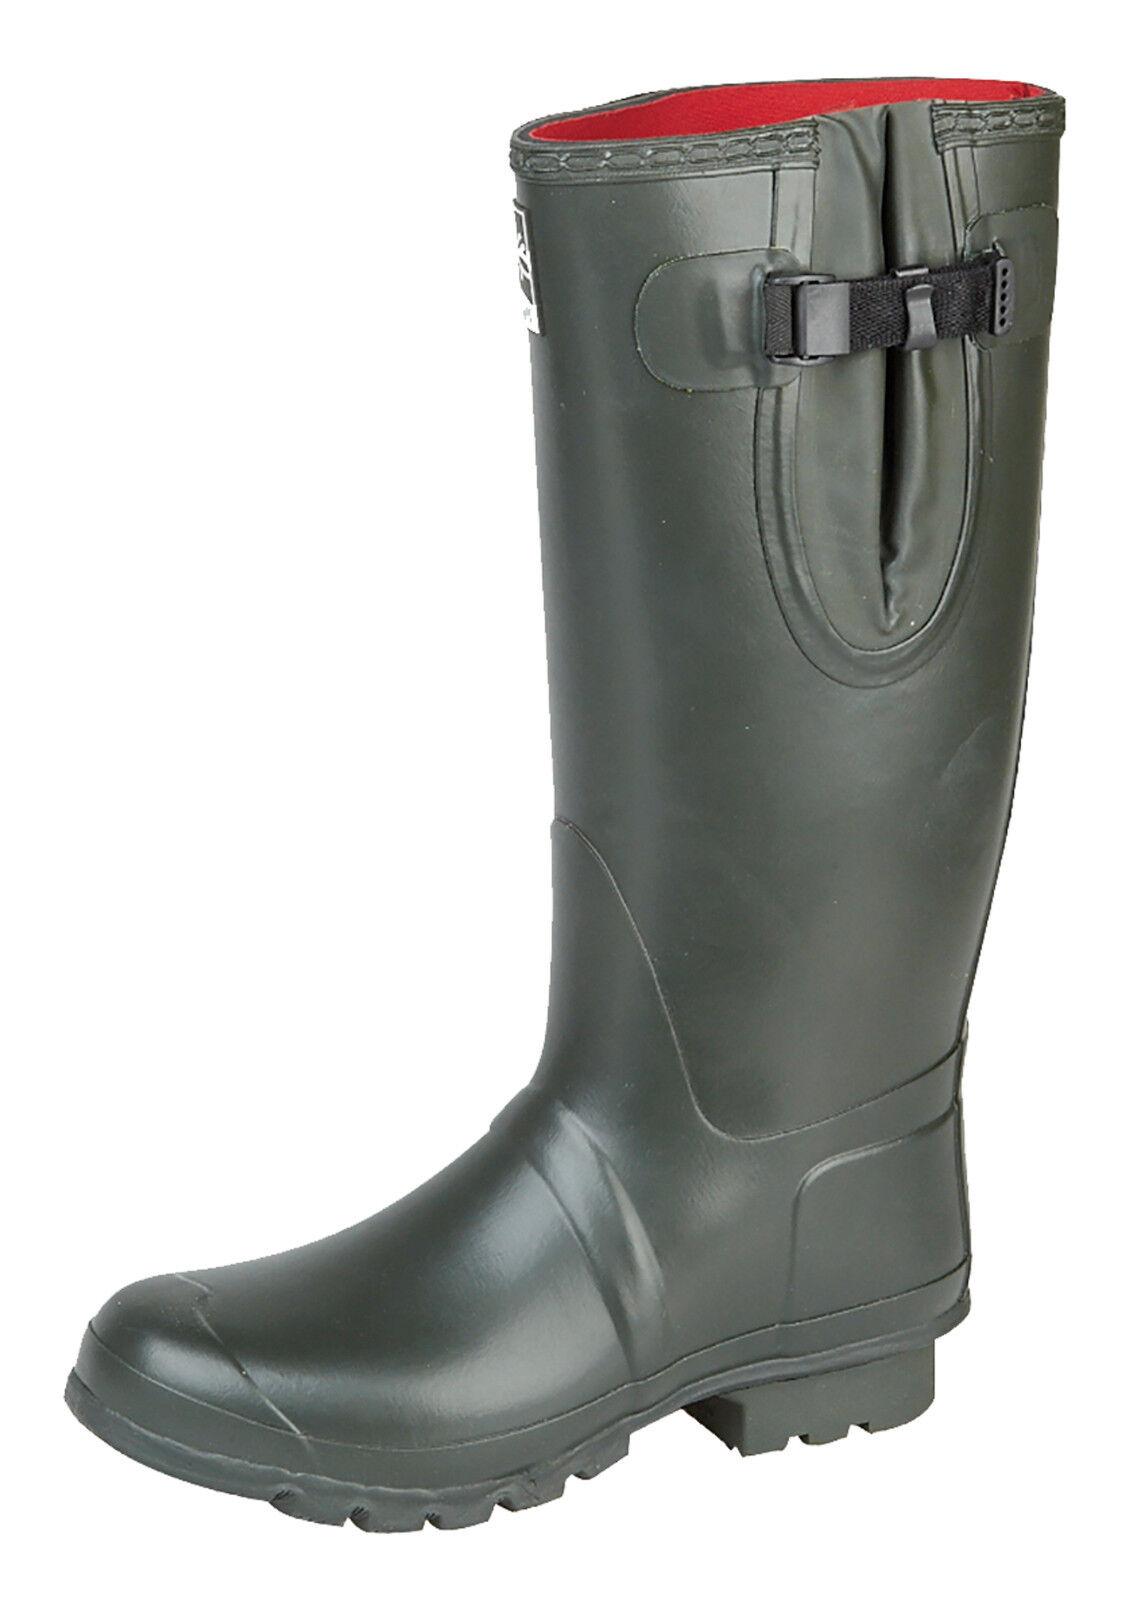 Woodland Neoprene Gusset Wellington Boots Unisex Olive Green Insulated Wellies